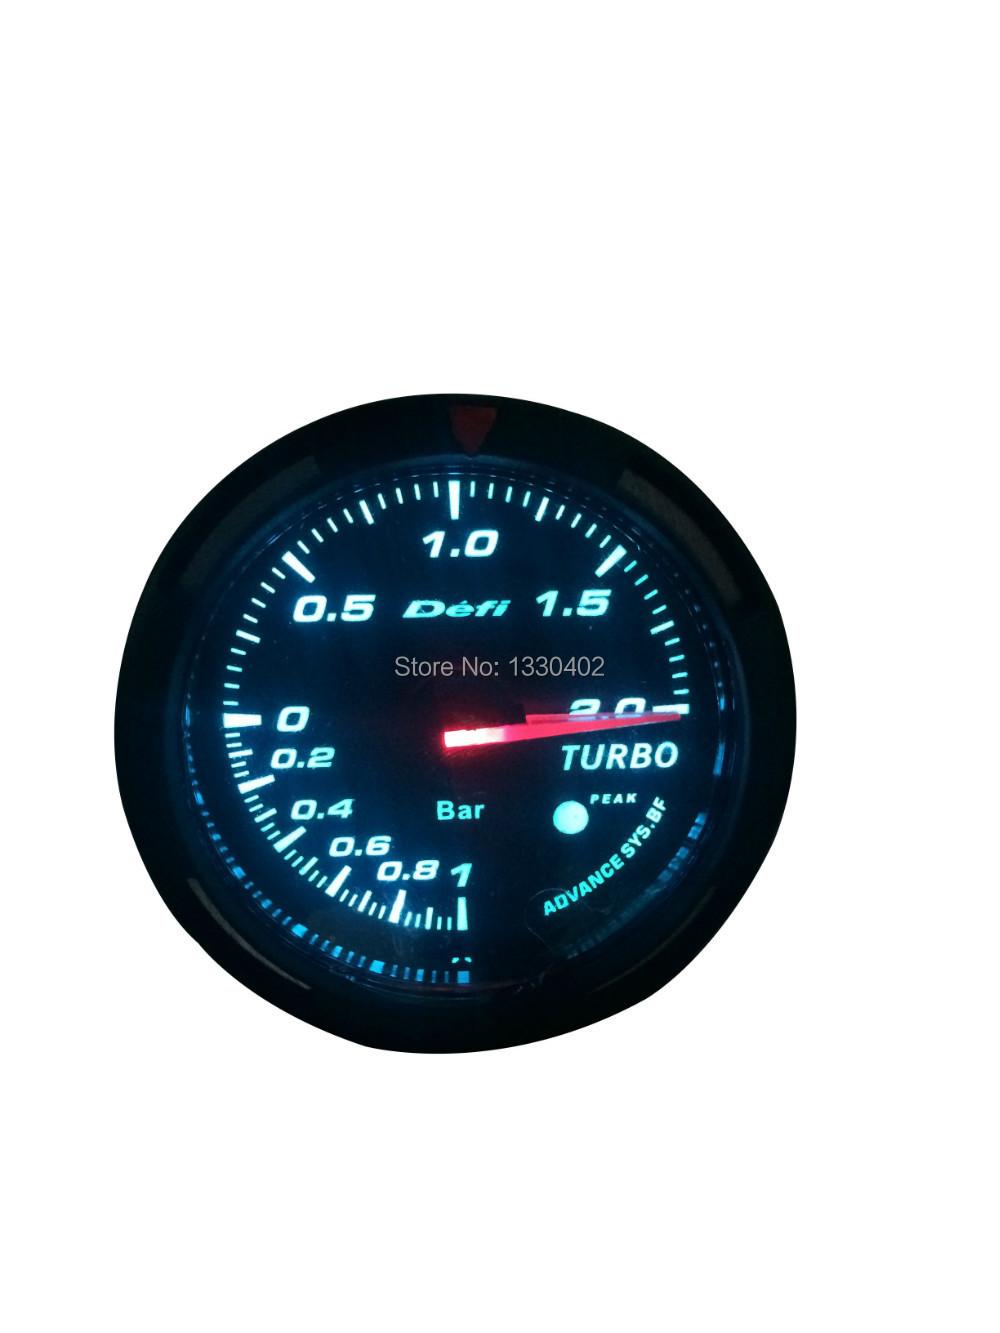 2 5 defi advanced bf oil temp gauge auto gauge 60mm turbo tachometer volt water temp oil press. Black Bedroom Furniture Sets. Home Design Ideas